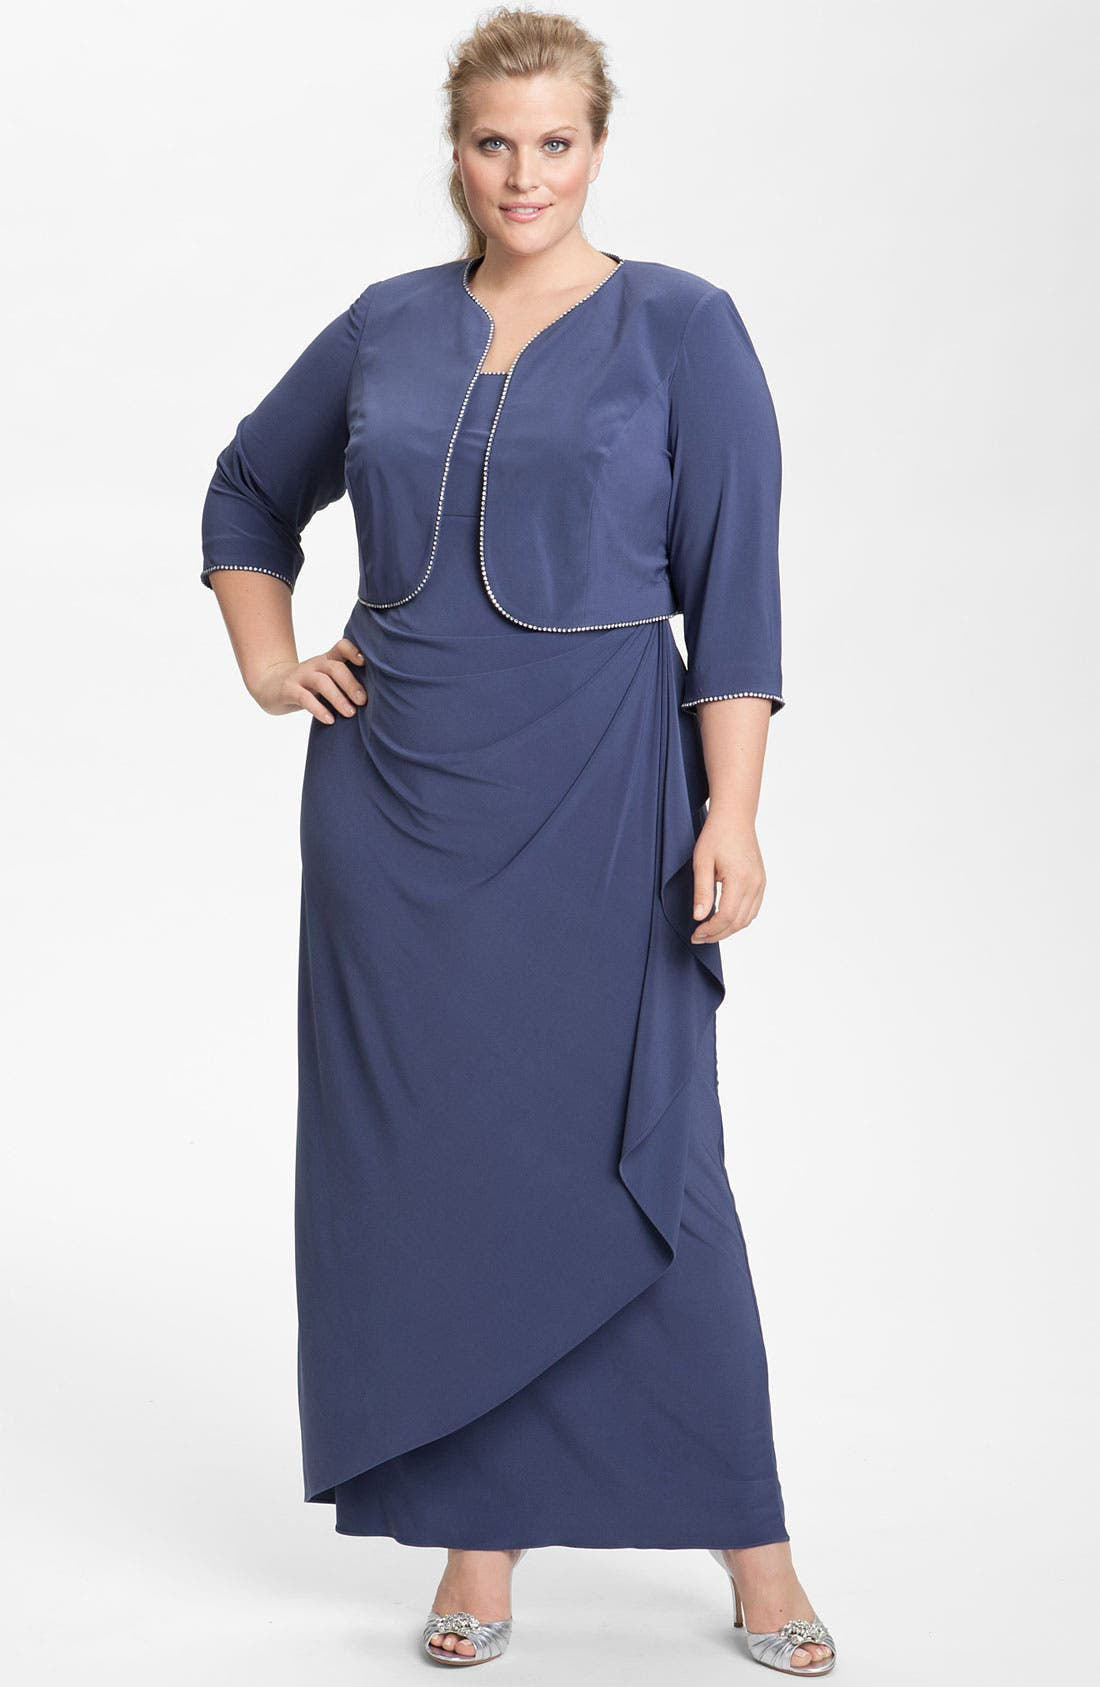 Alternate Image 1 Selected - Alex Evenings Rhinestone Jersey Dress & Bolero (Plus)